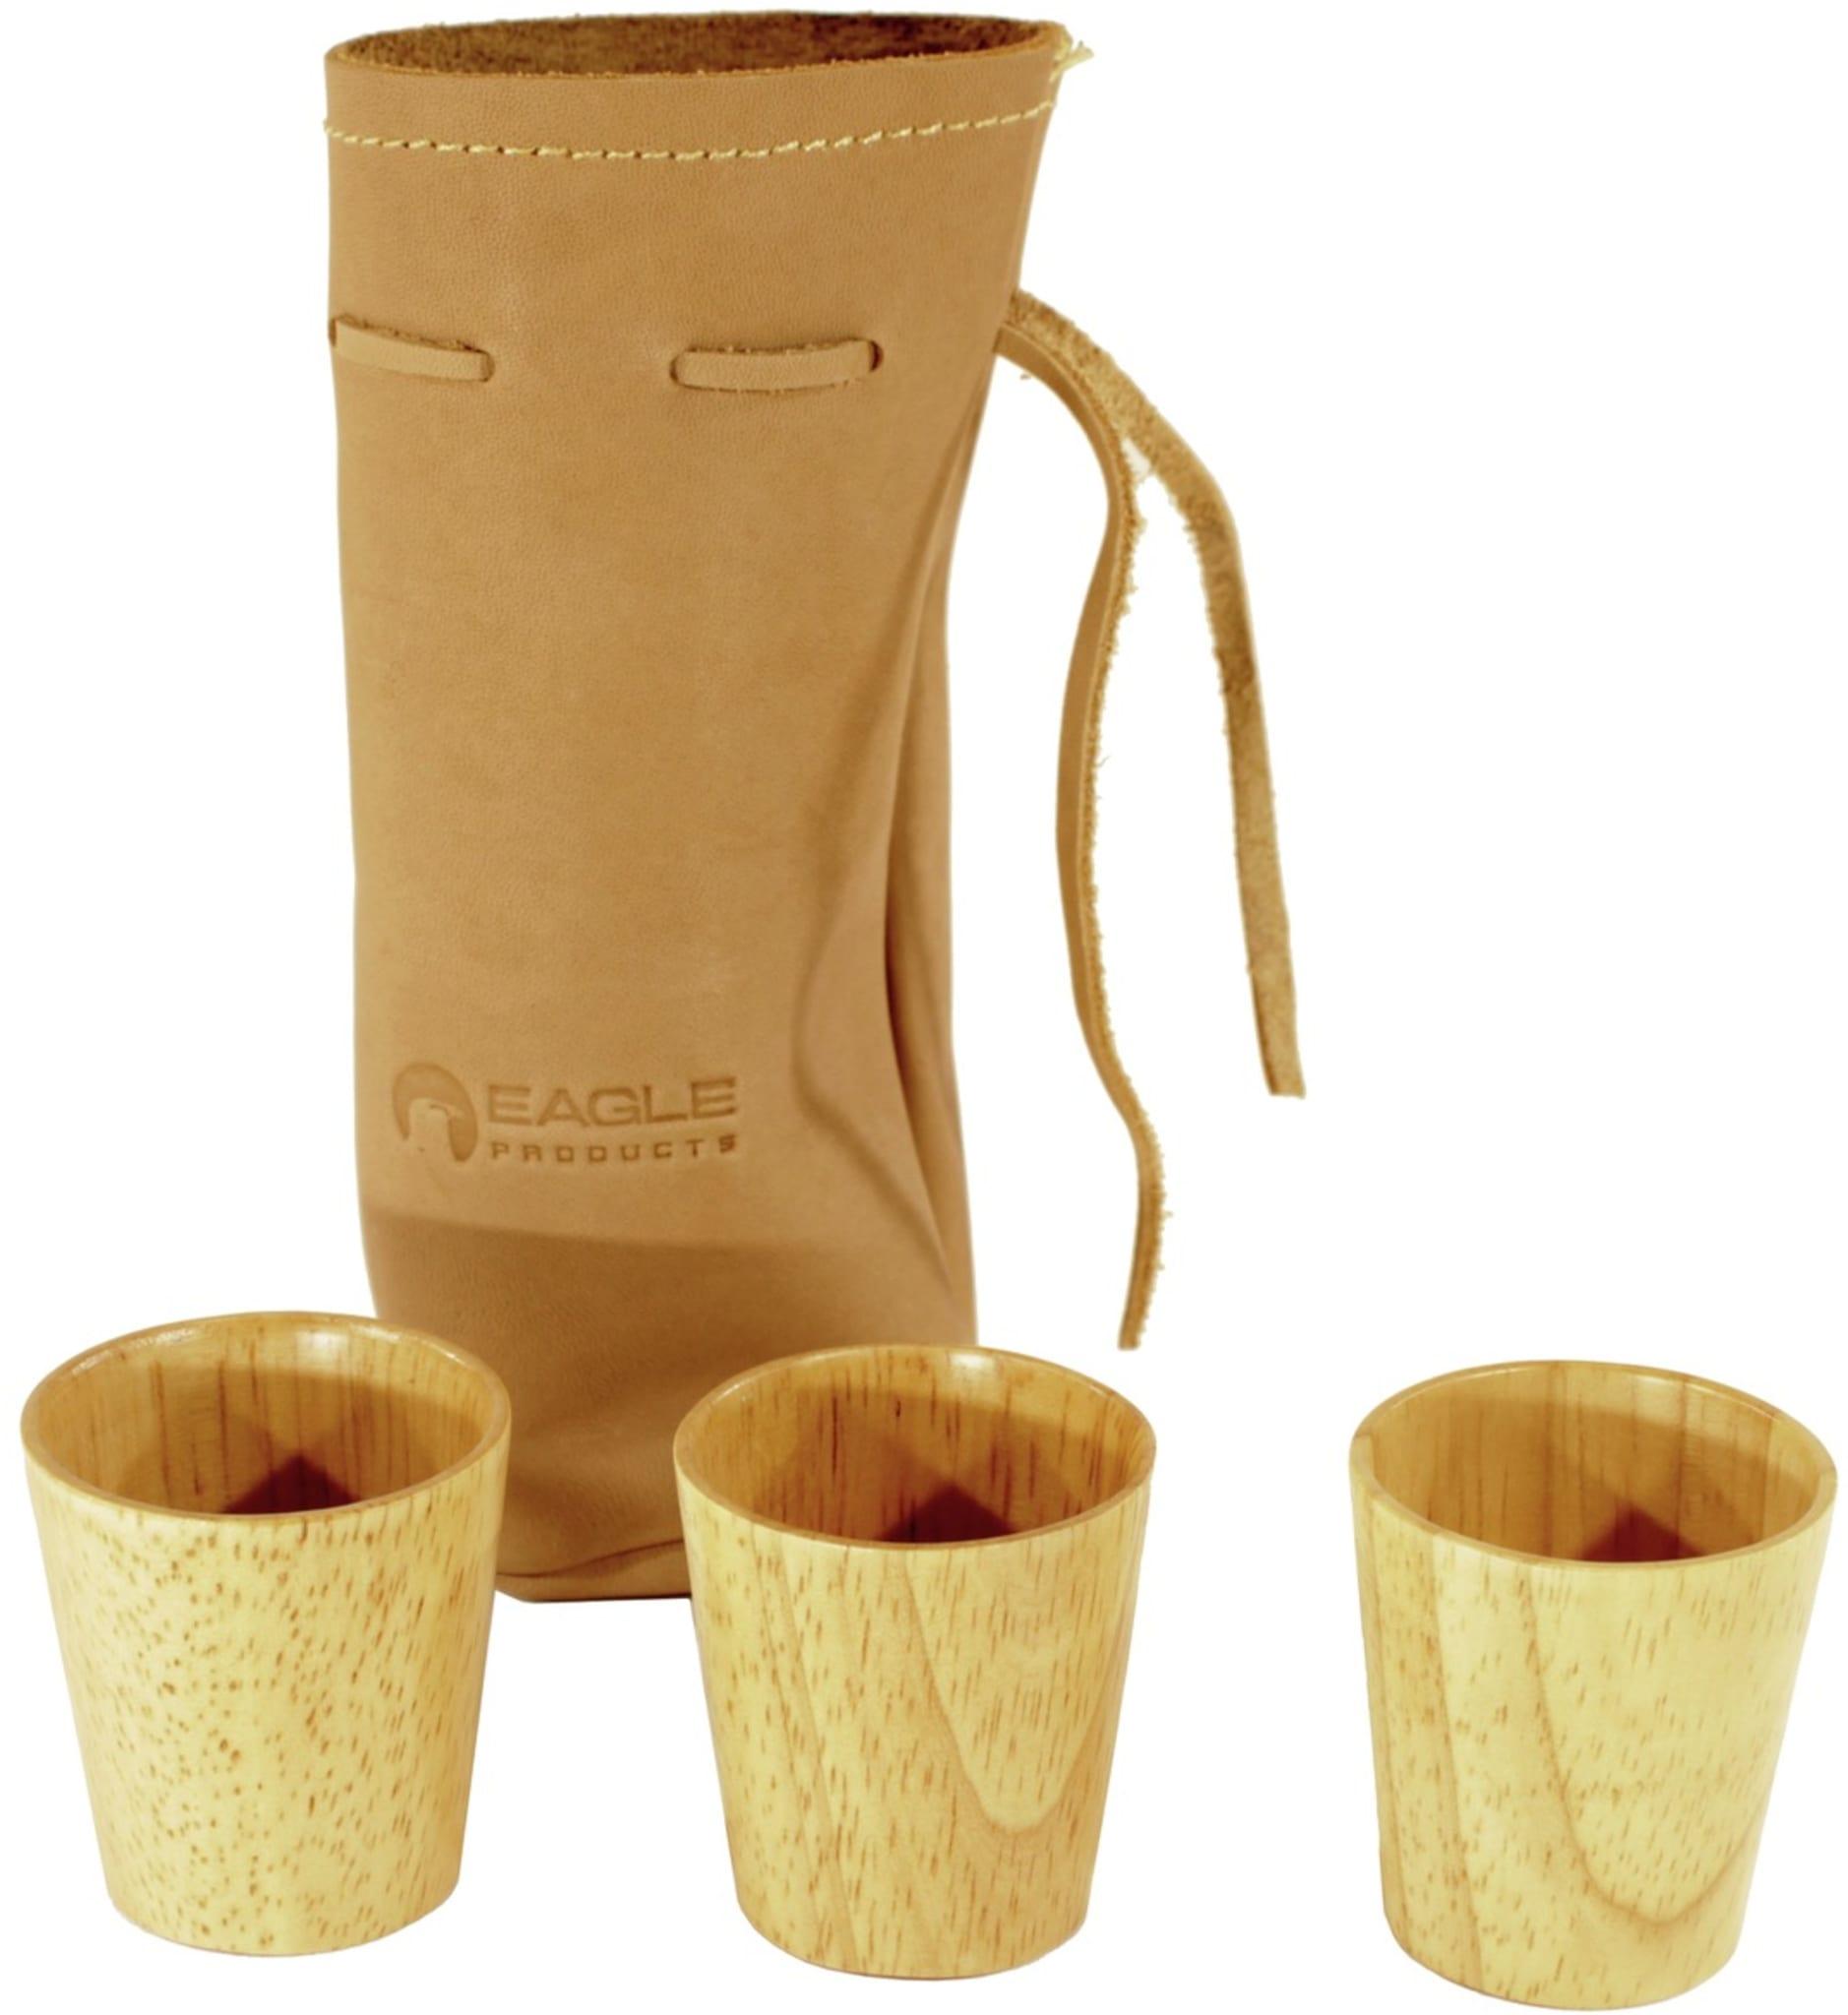 Holdbare og elegante drammeglass i tre